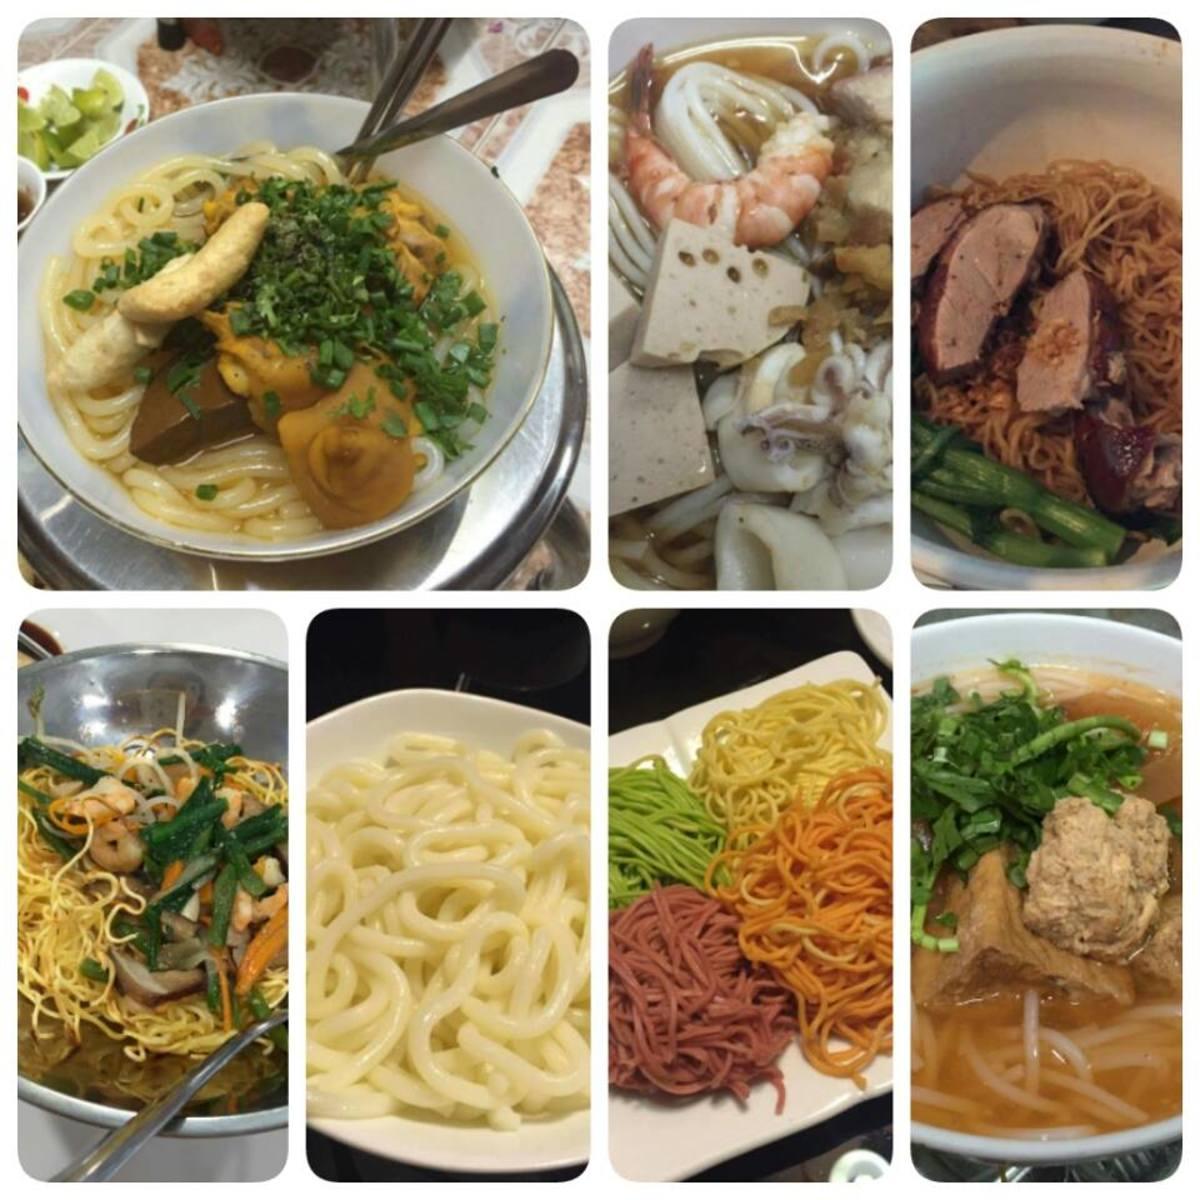 Vietnam abounds in noodles